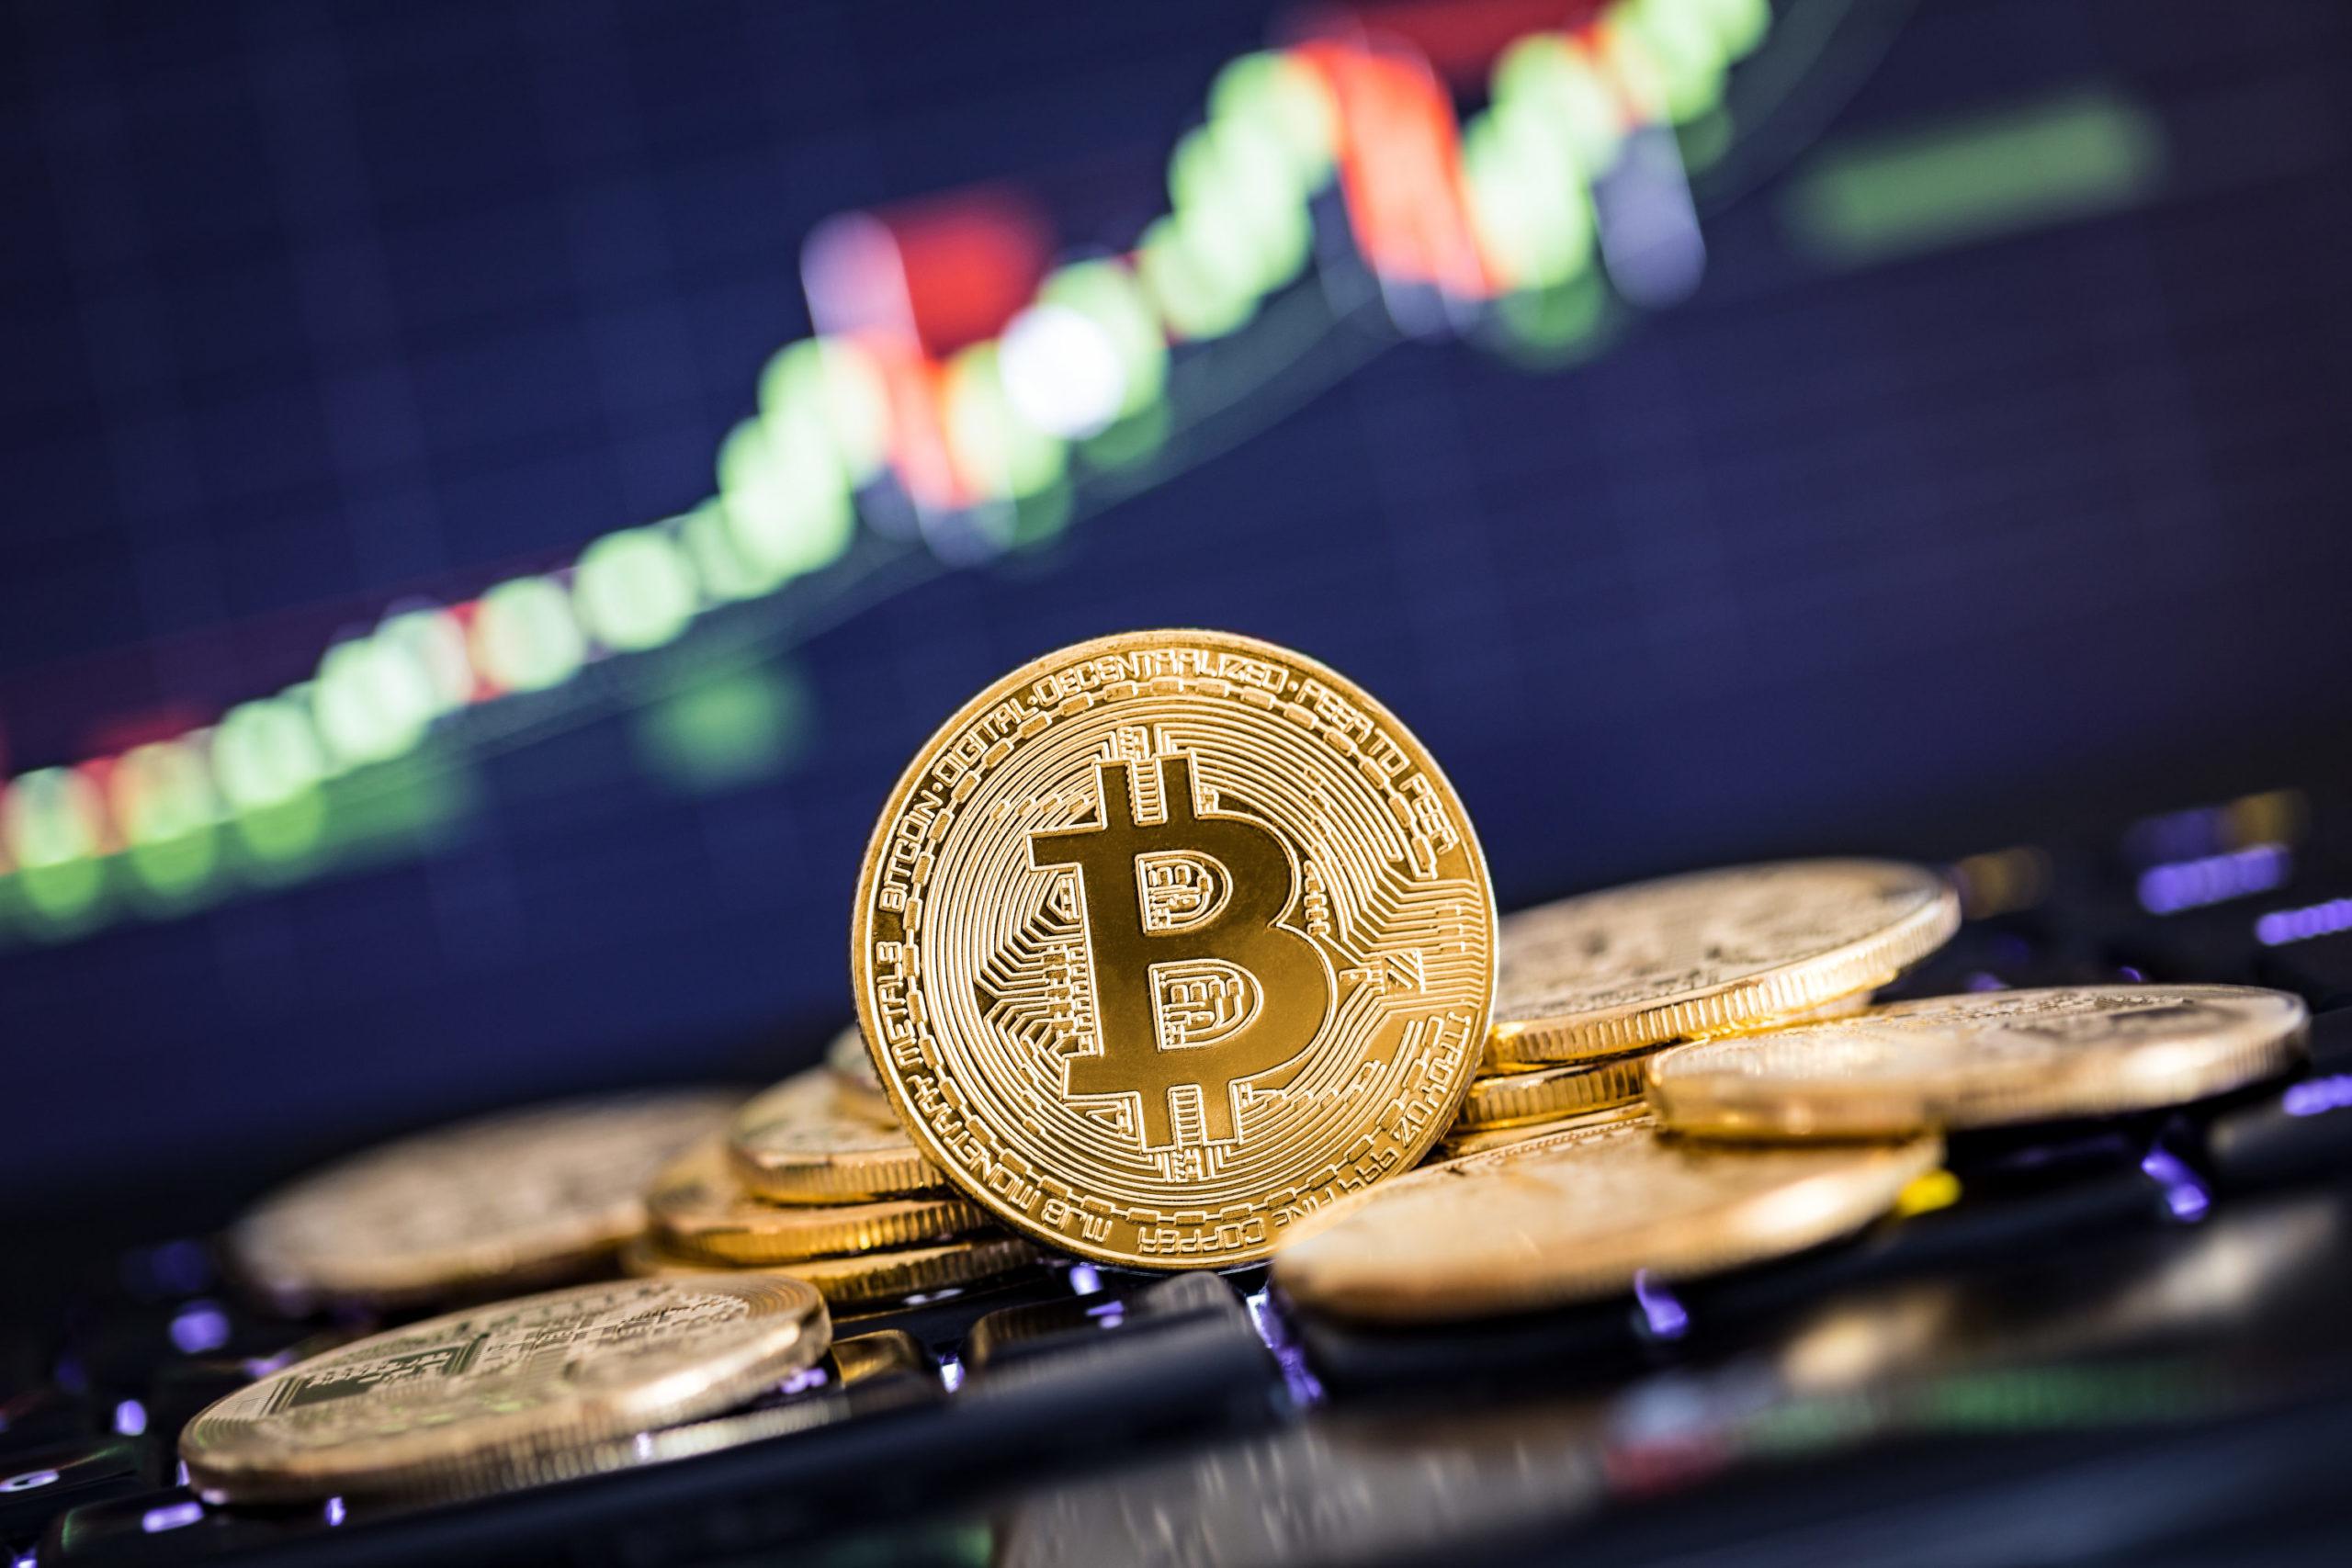 Bitcoin blommberg btc scaled